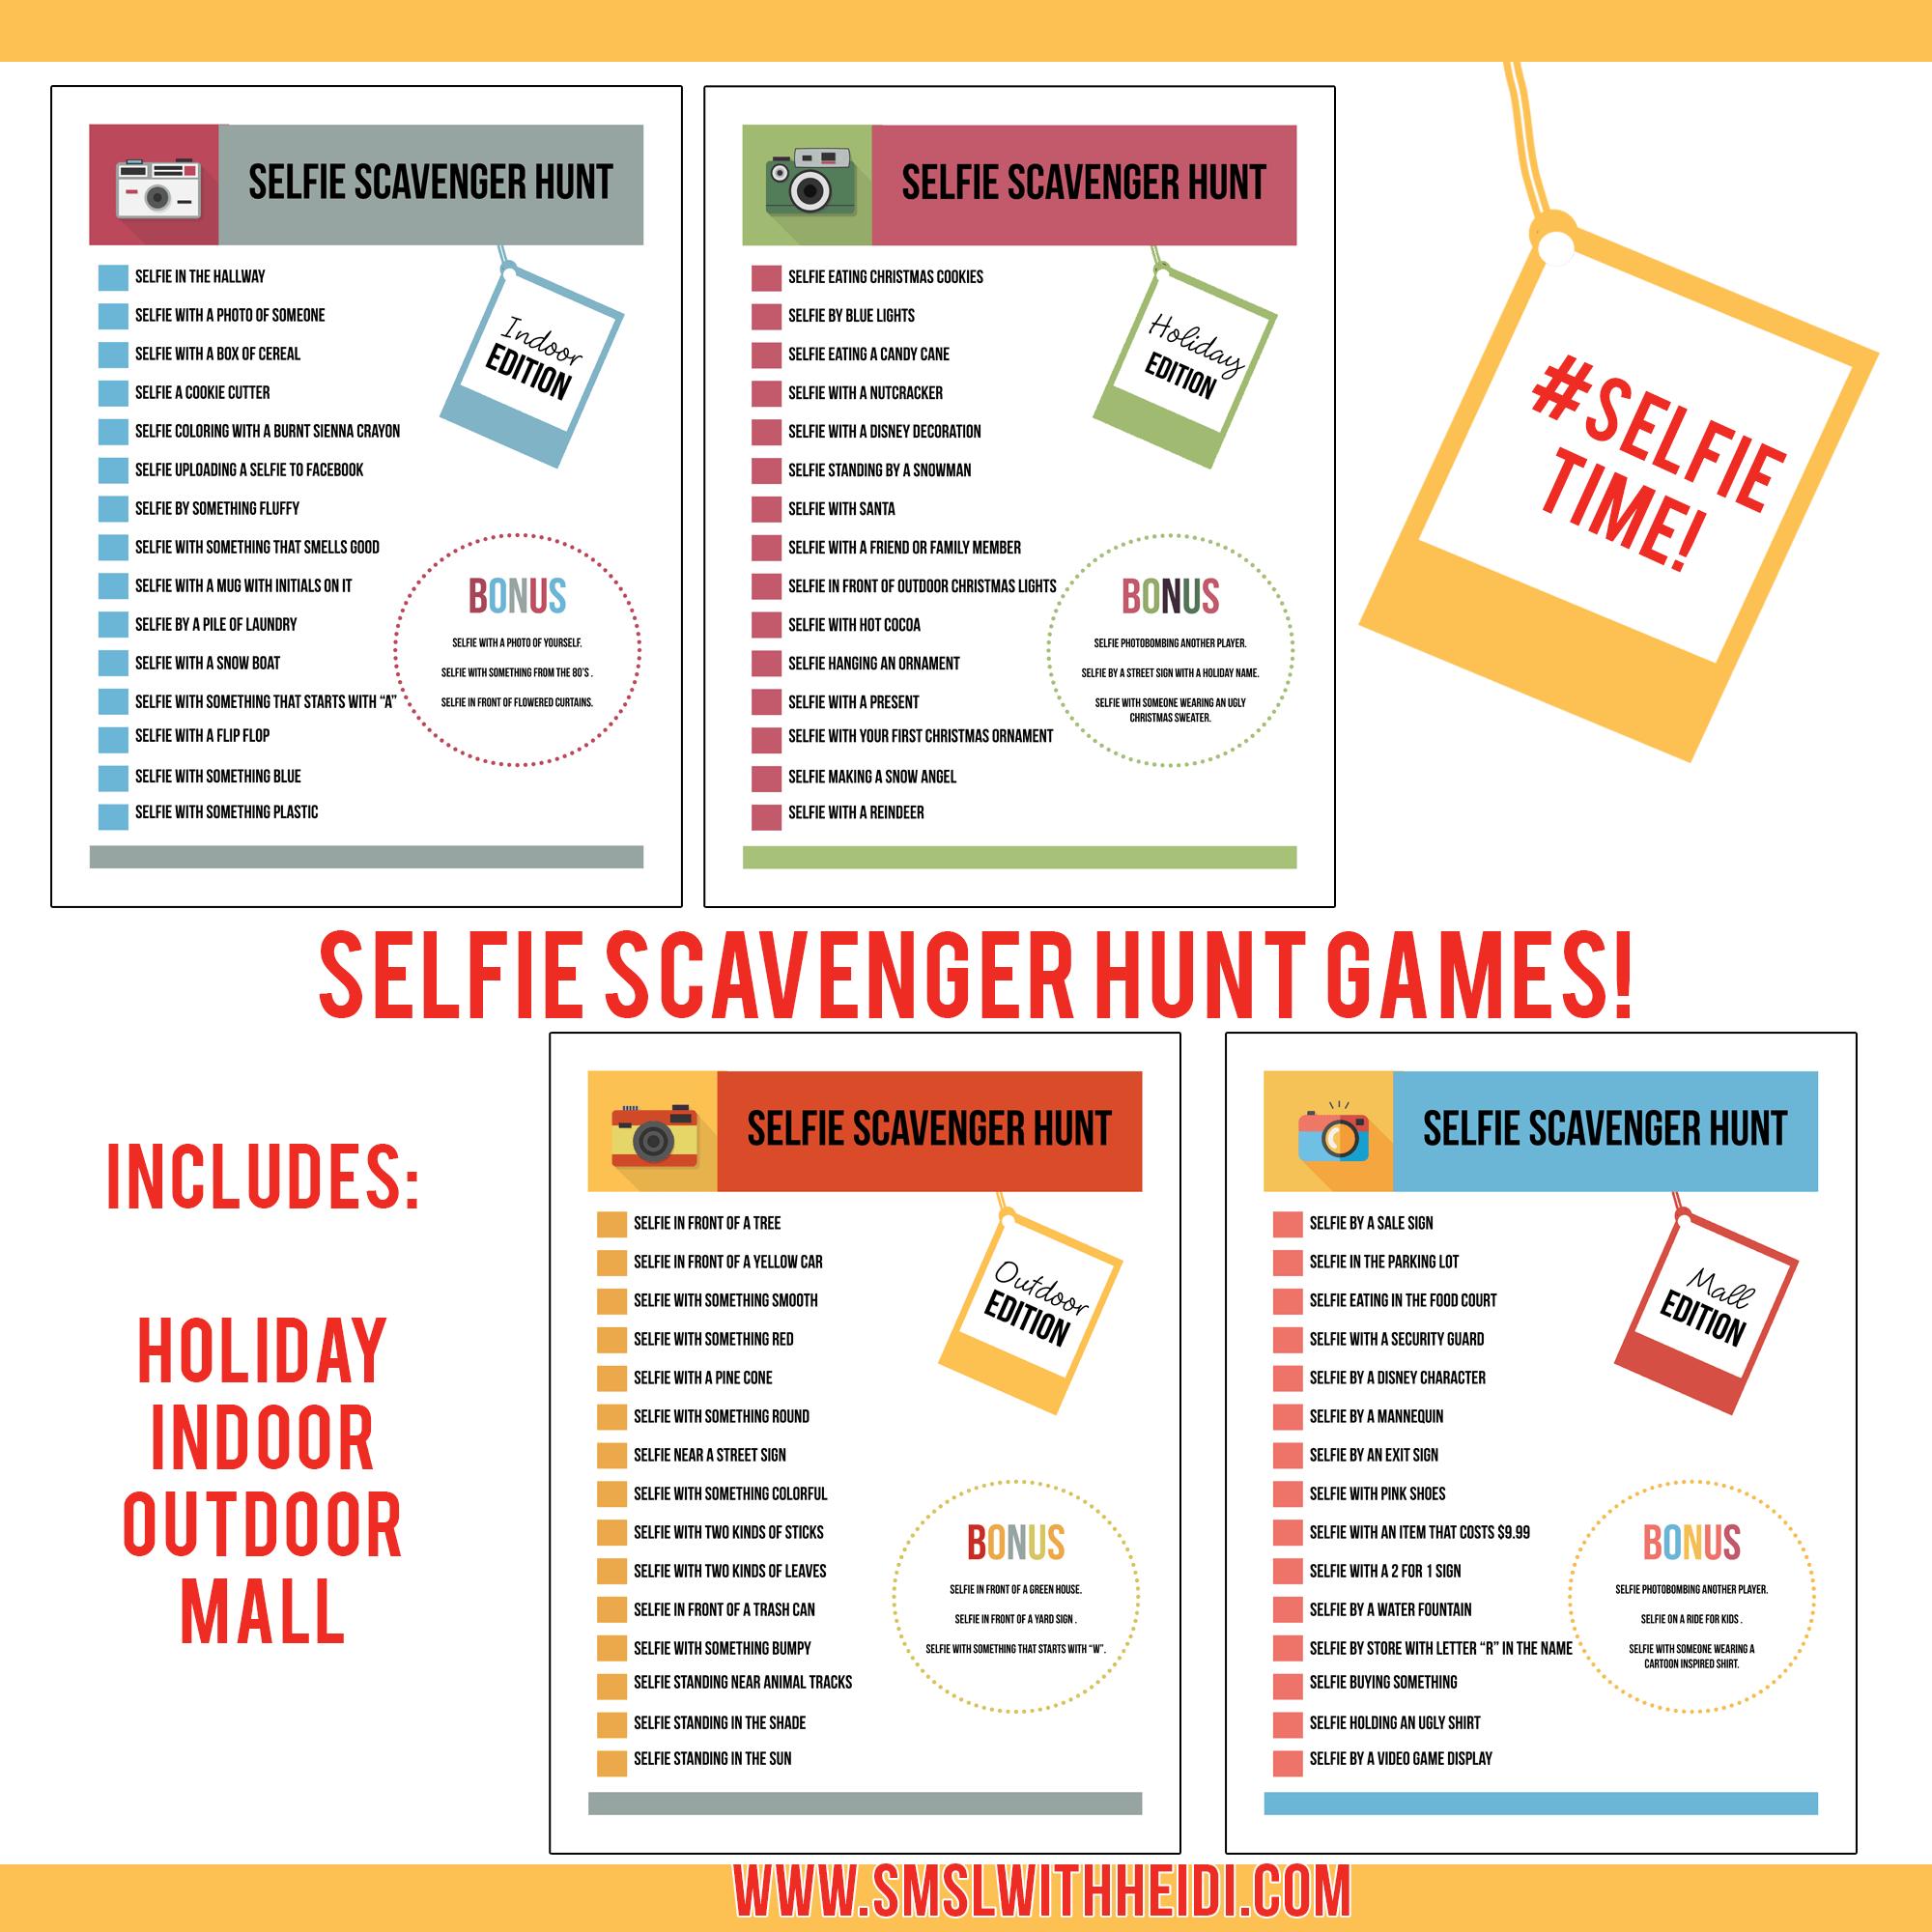 Selfie-scavenger-hunt